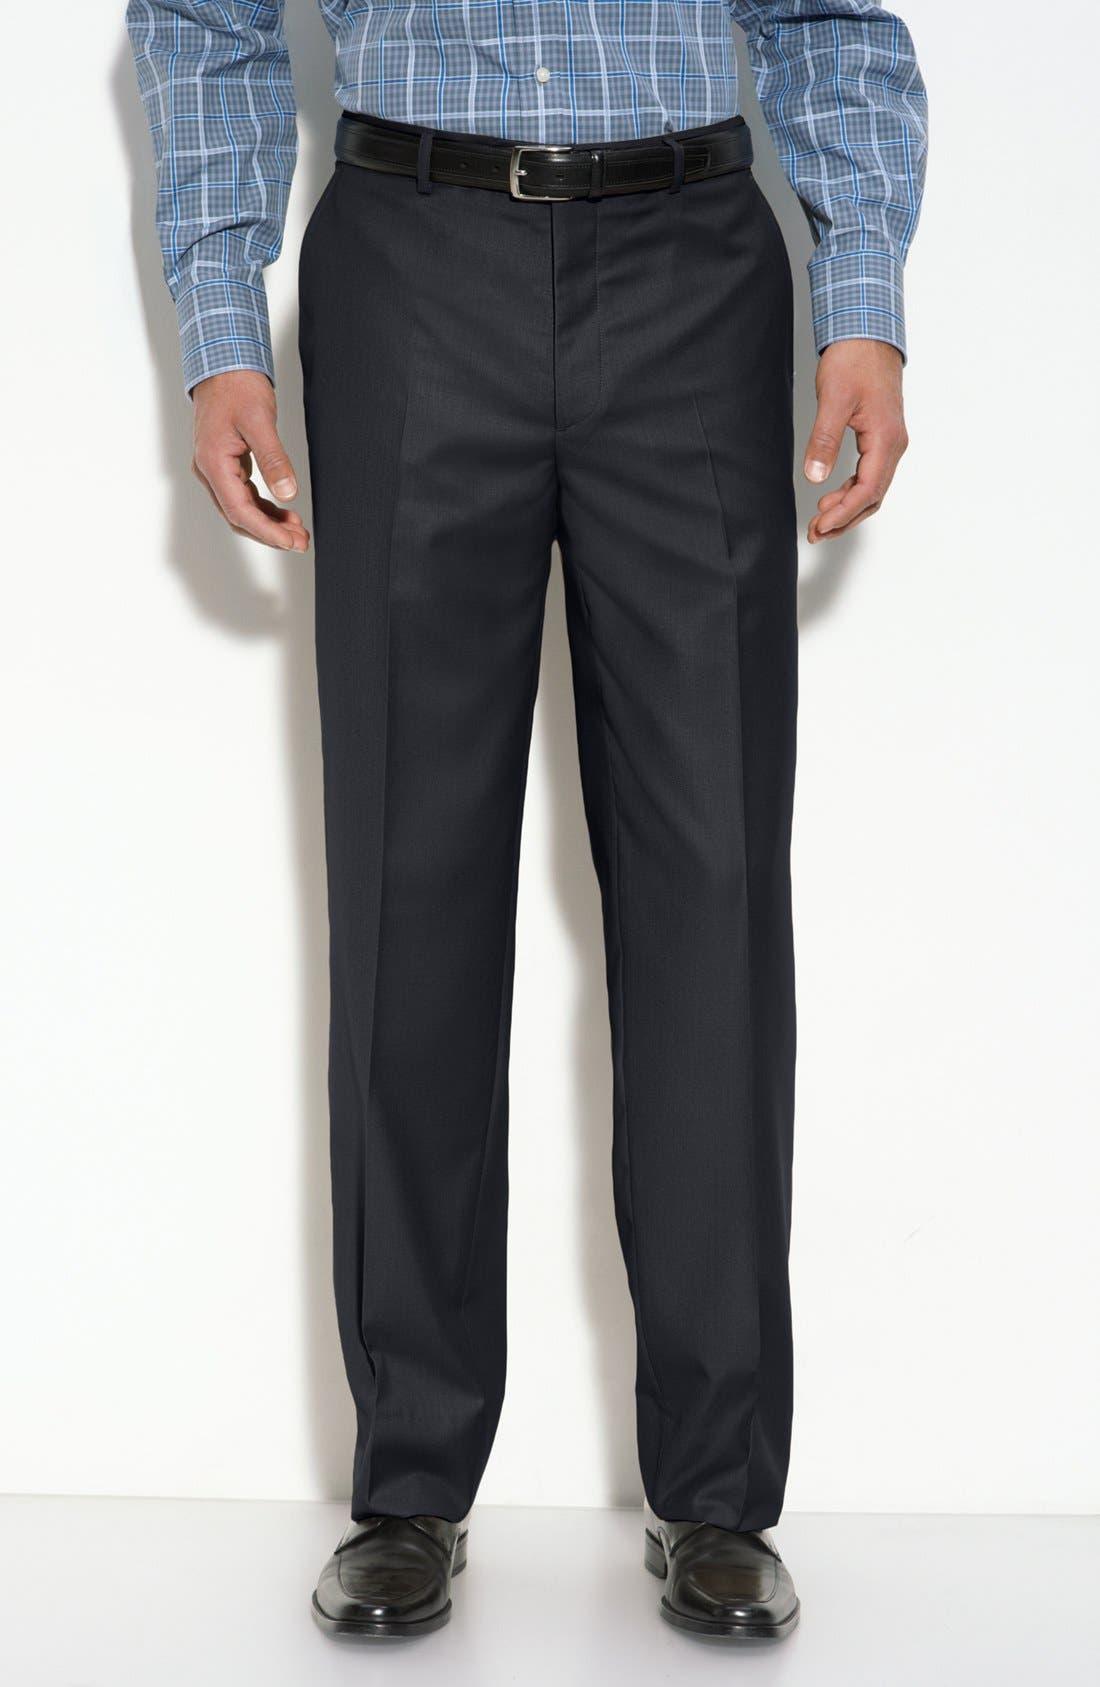 Linea Naturale 'Travel Genius - Hawk' Flat Front Pants